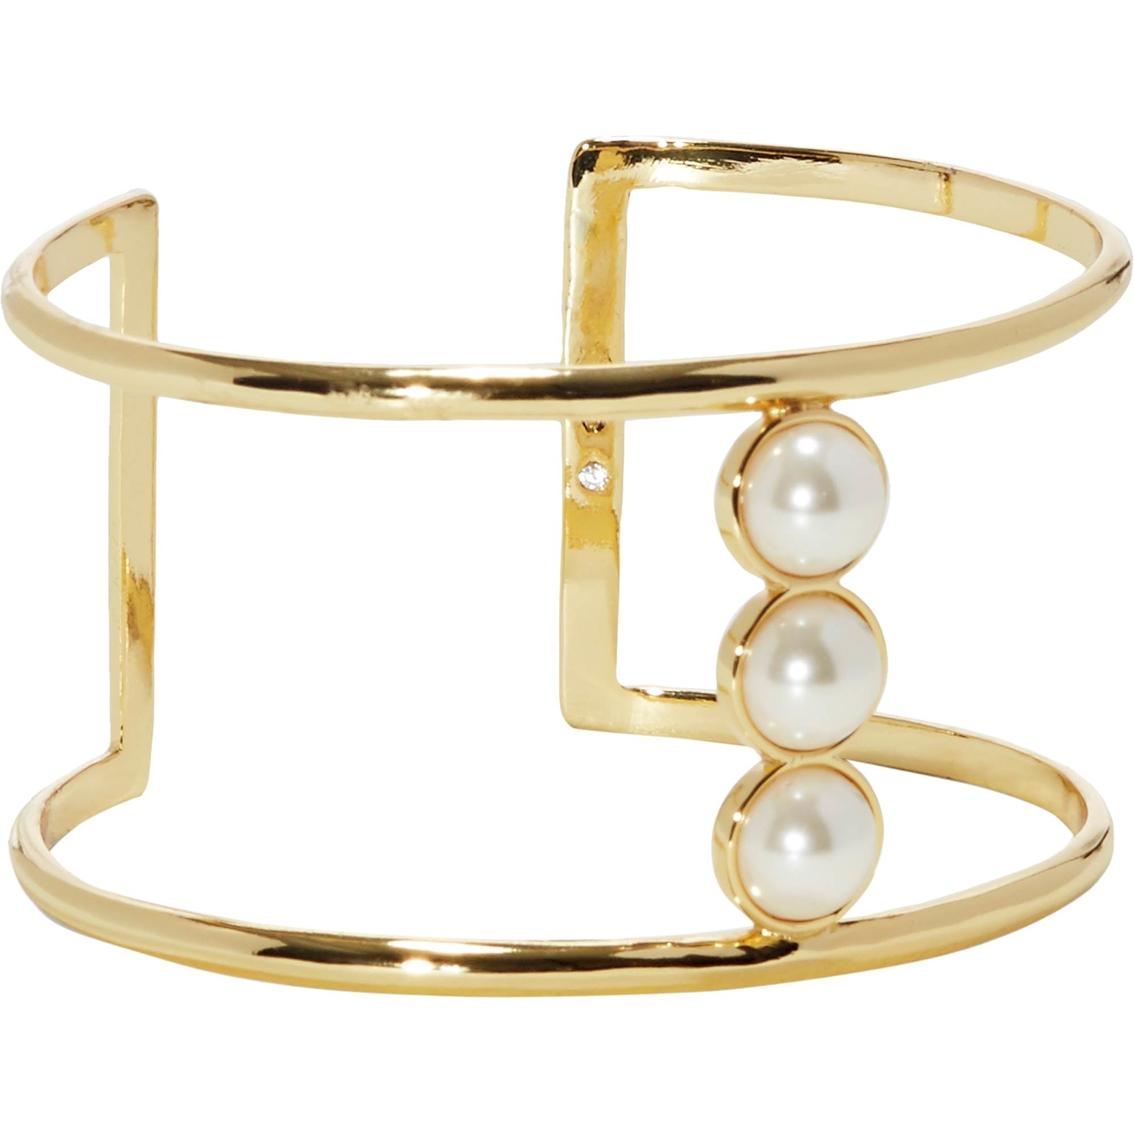 Vince Camuto Goldtone Cuff Bracelet